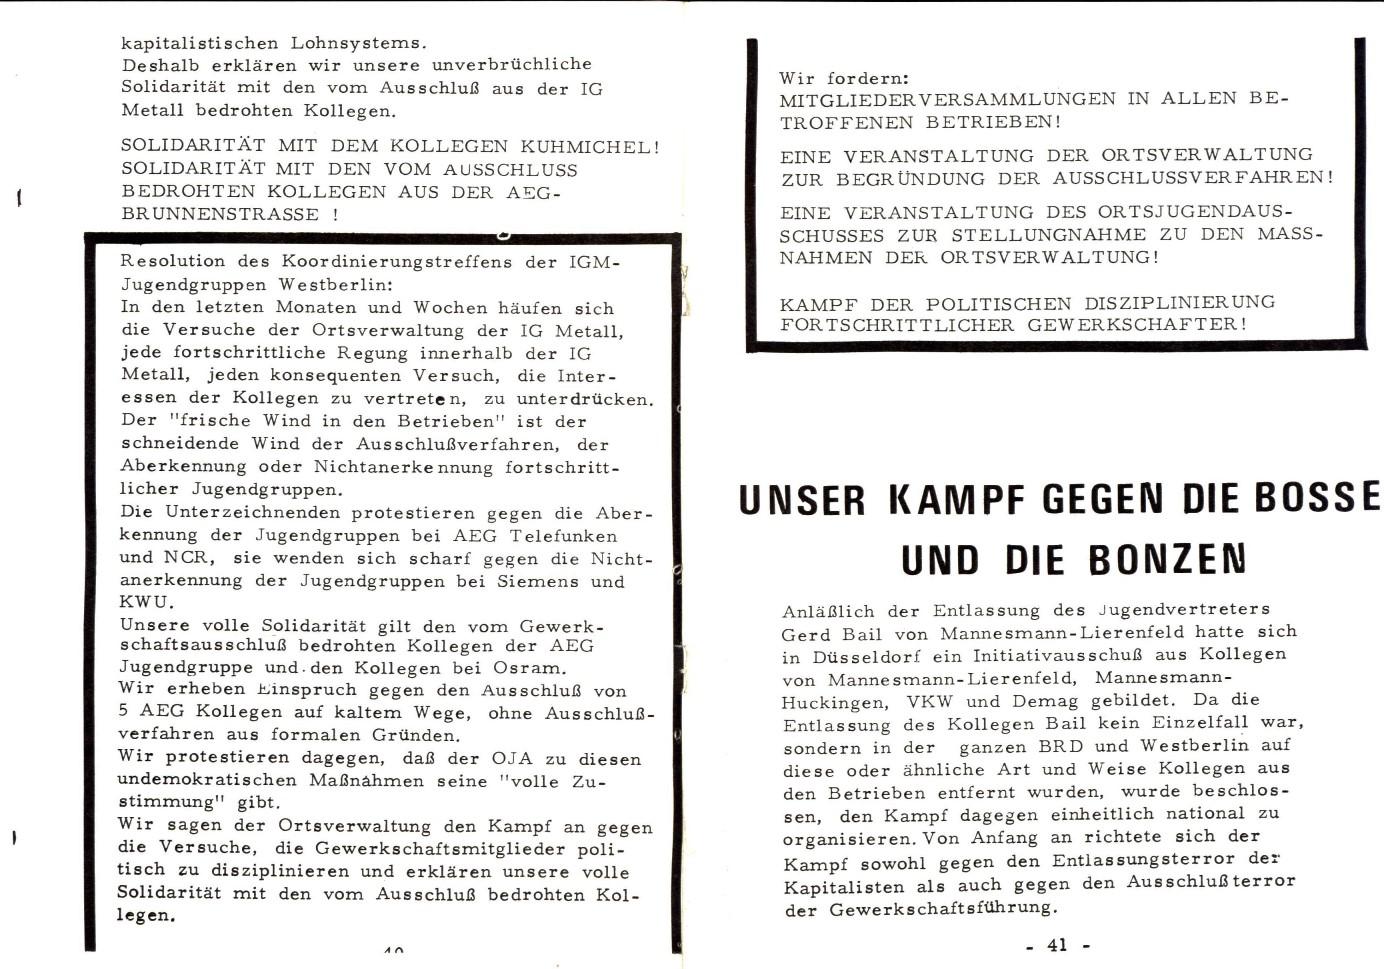 KJV_1973_NK_Arbeiterjugend_22